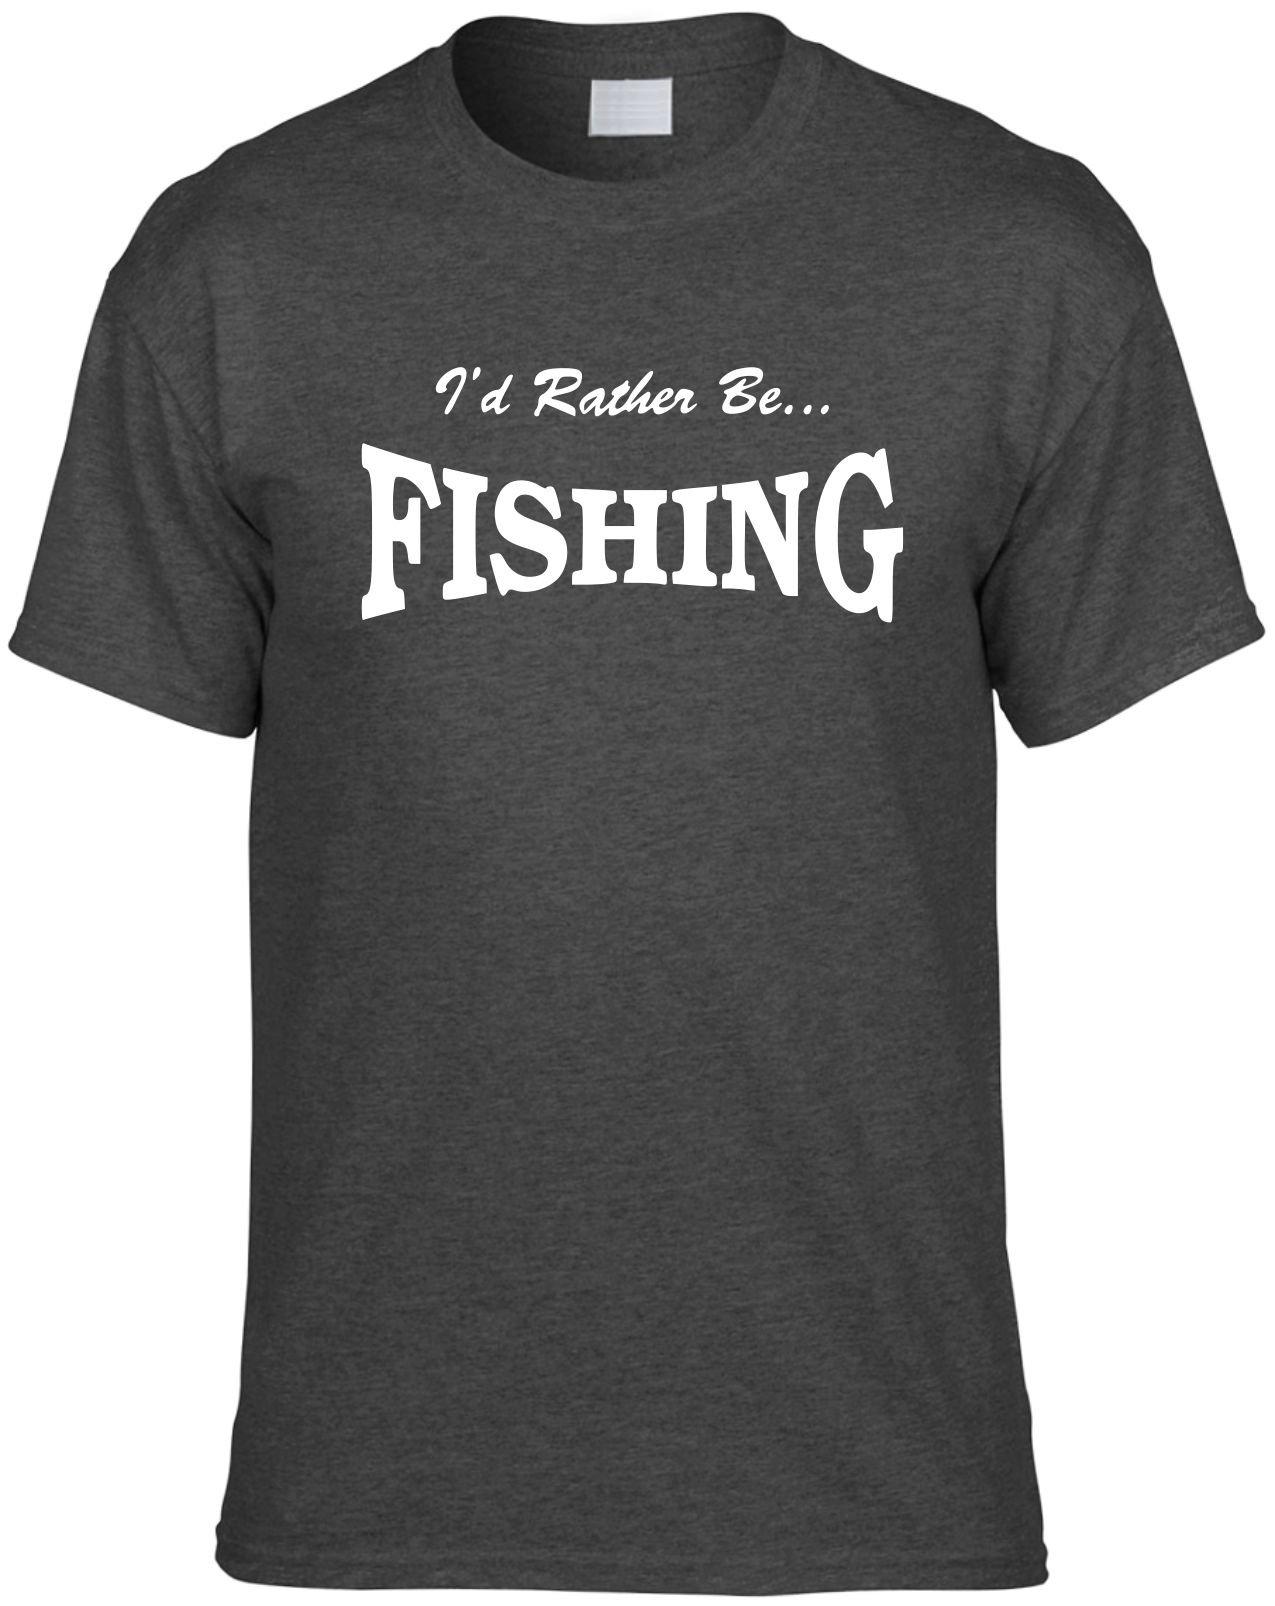 S Funny T Shirt I D Rather Be Fishing Novelty Unisex Shirt 1295